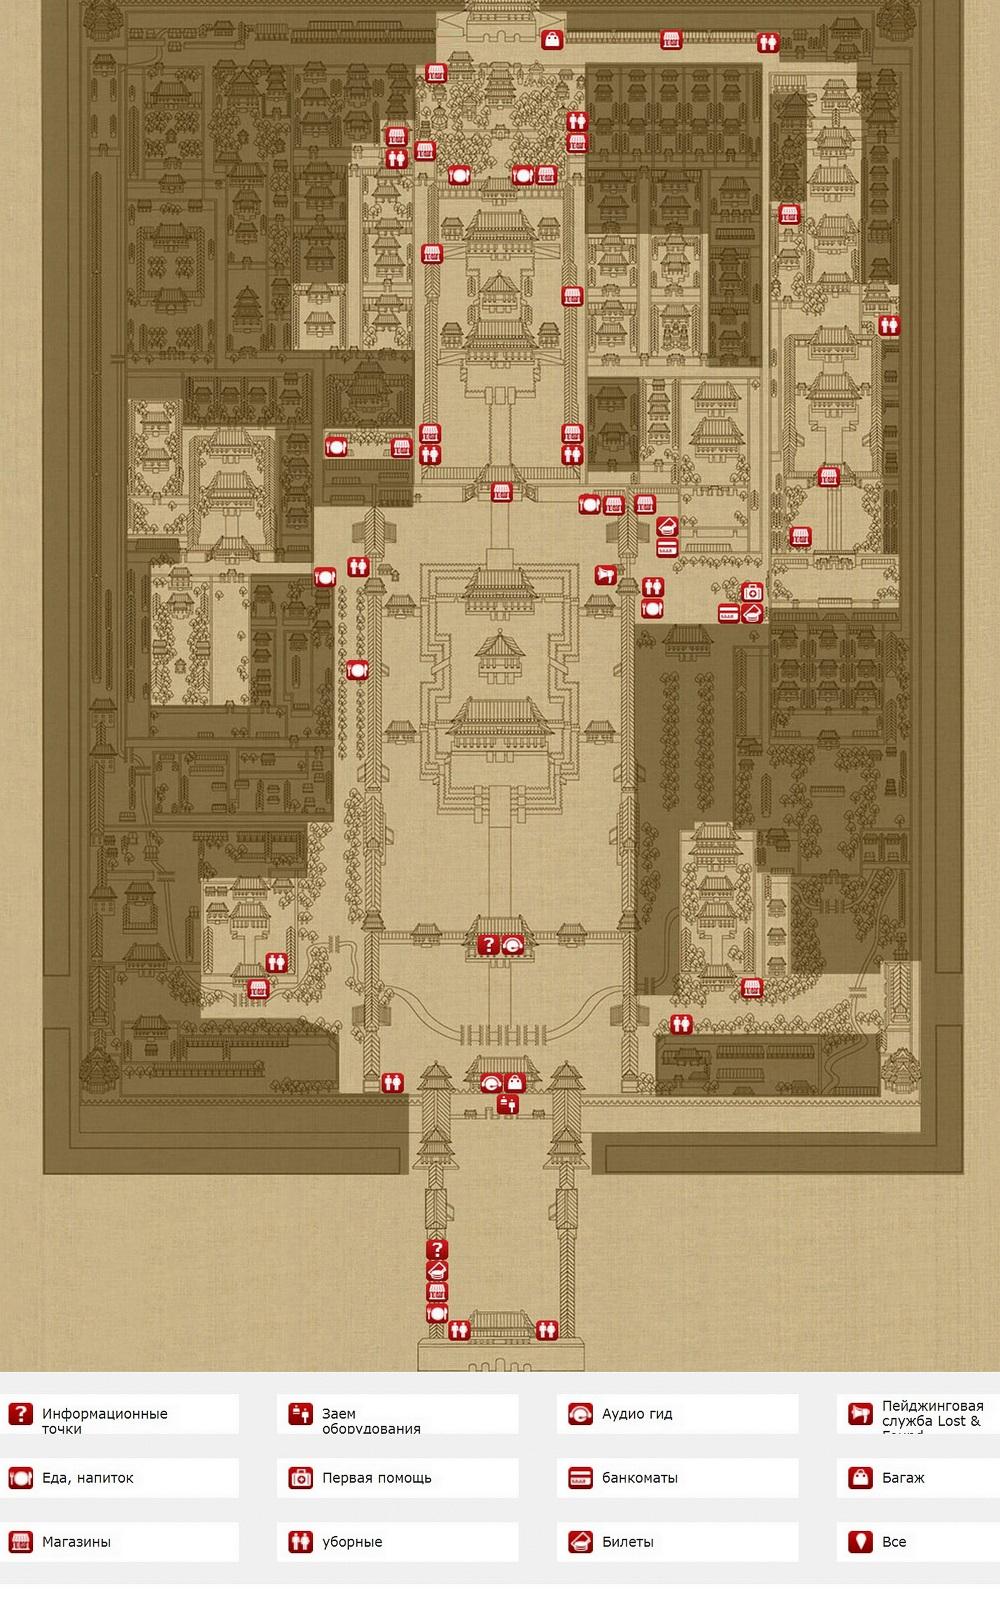 Схема туристических объектов